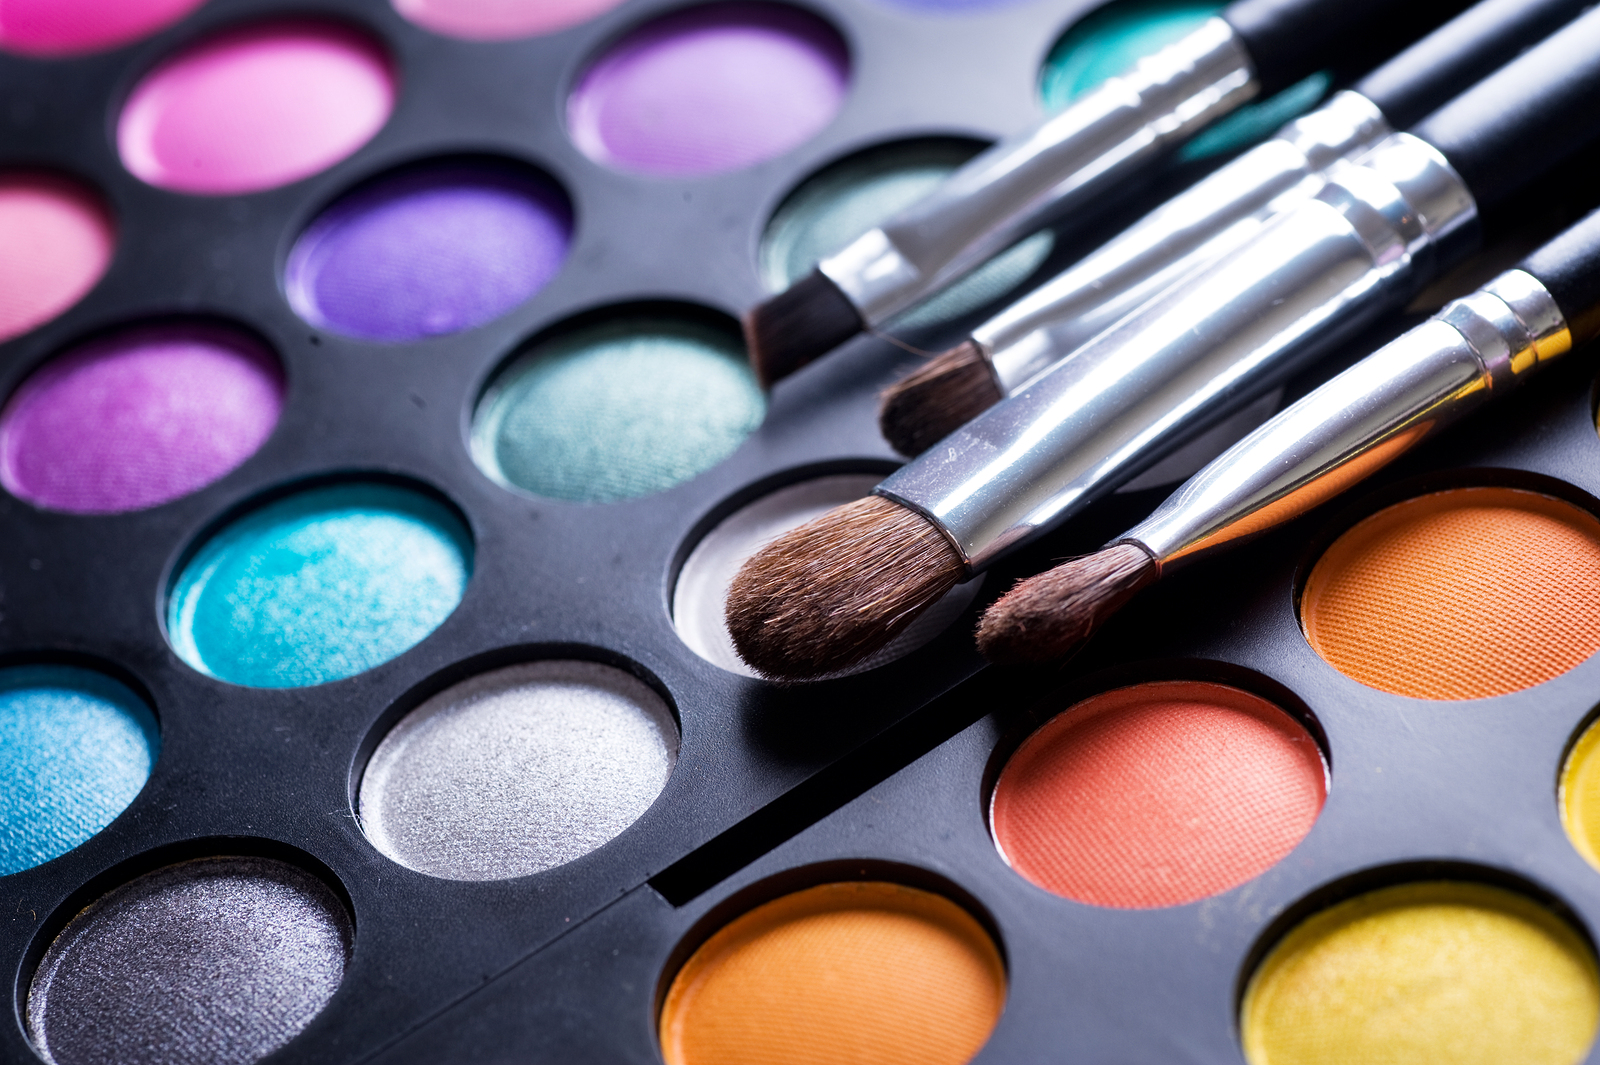 bigstock-Makeup-brushes-and-make-up-eye-12577175.jpg